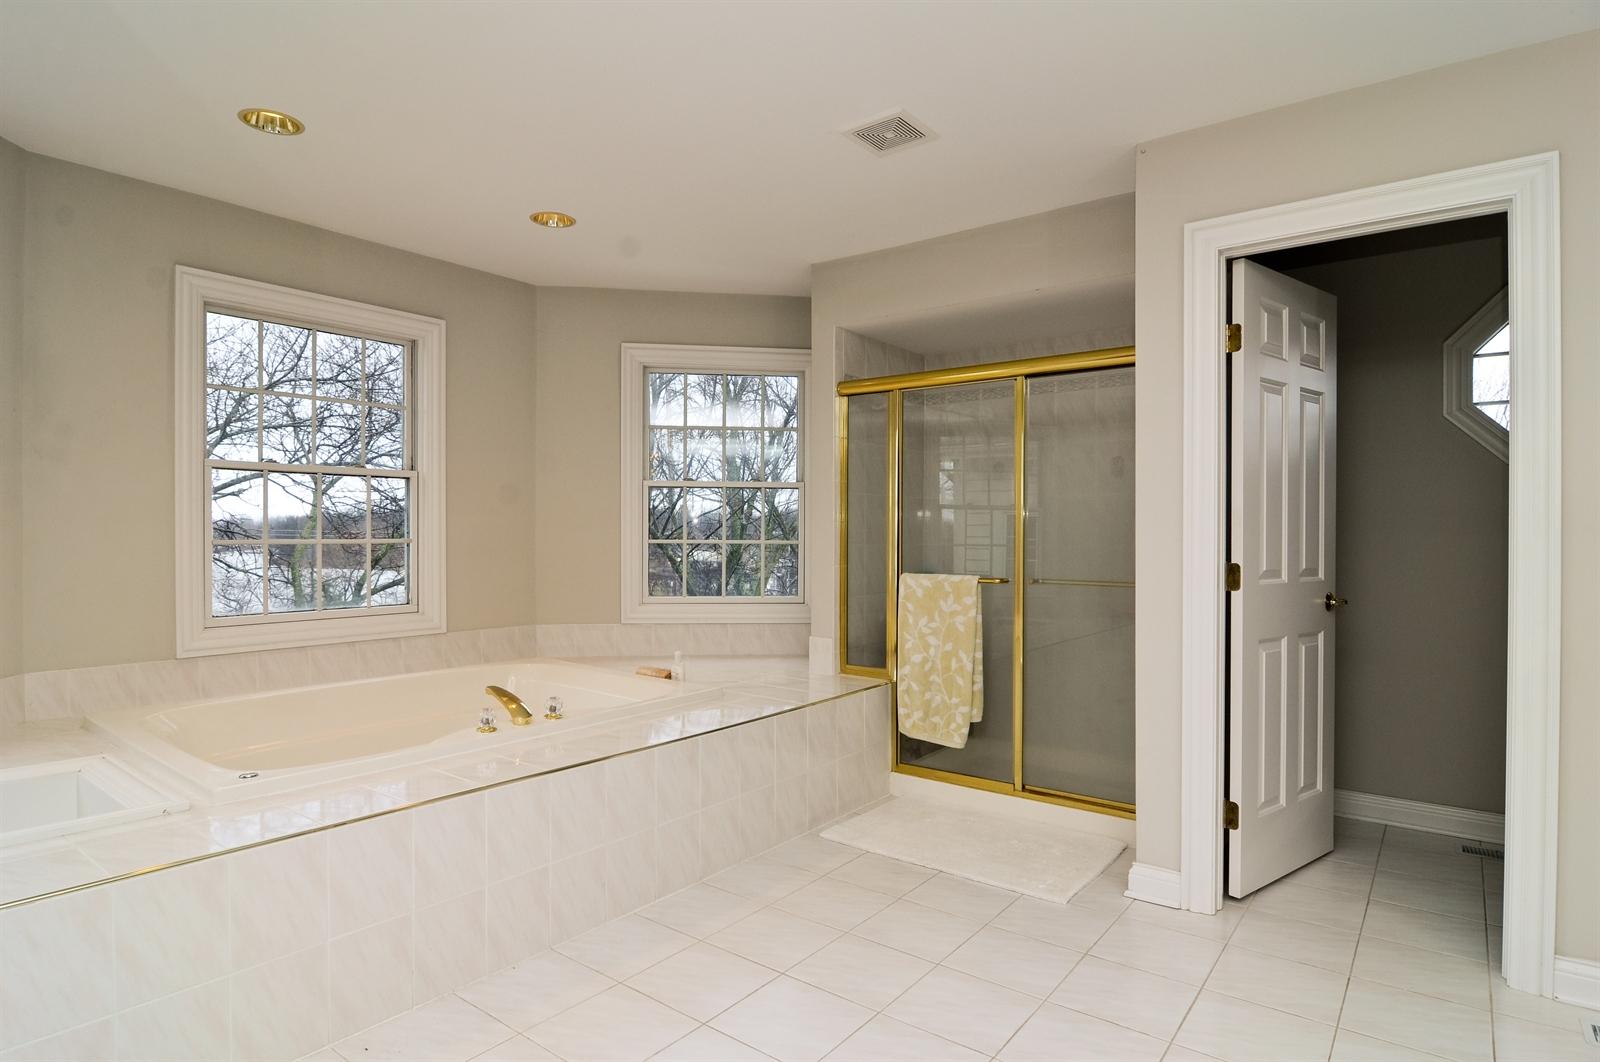 Real Estate Photography - 1020 Oakland, Barrington, IL, 60010 - Master Bathroom